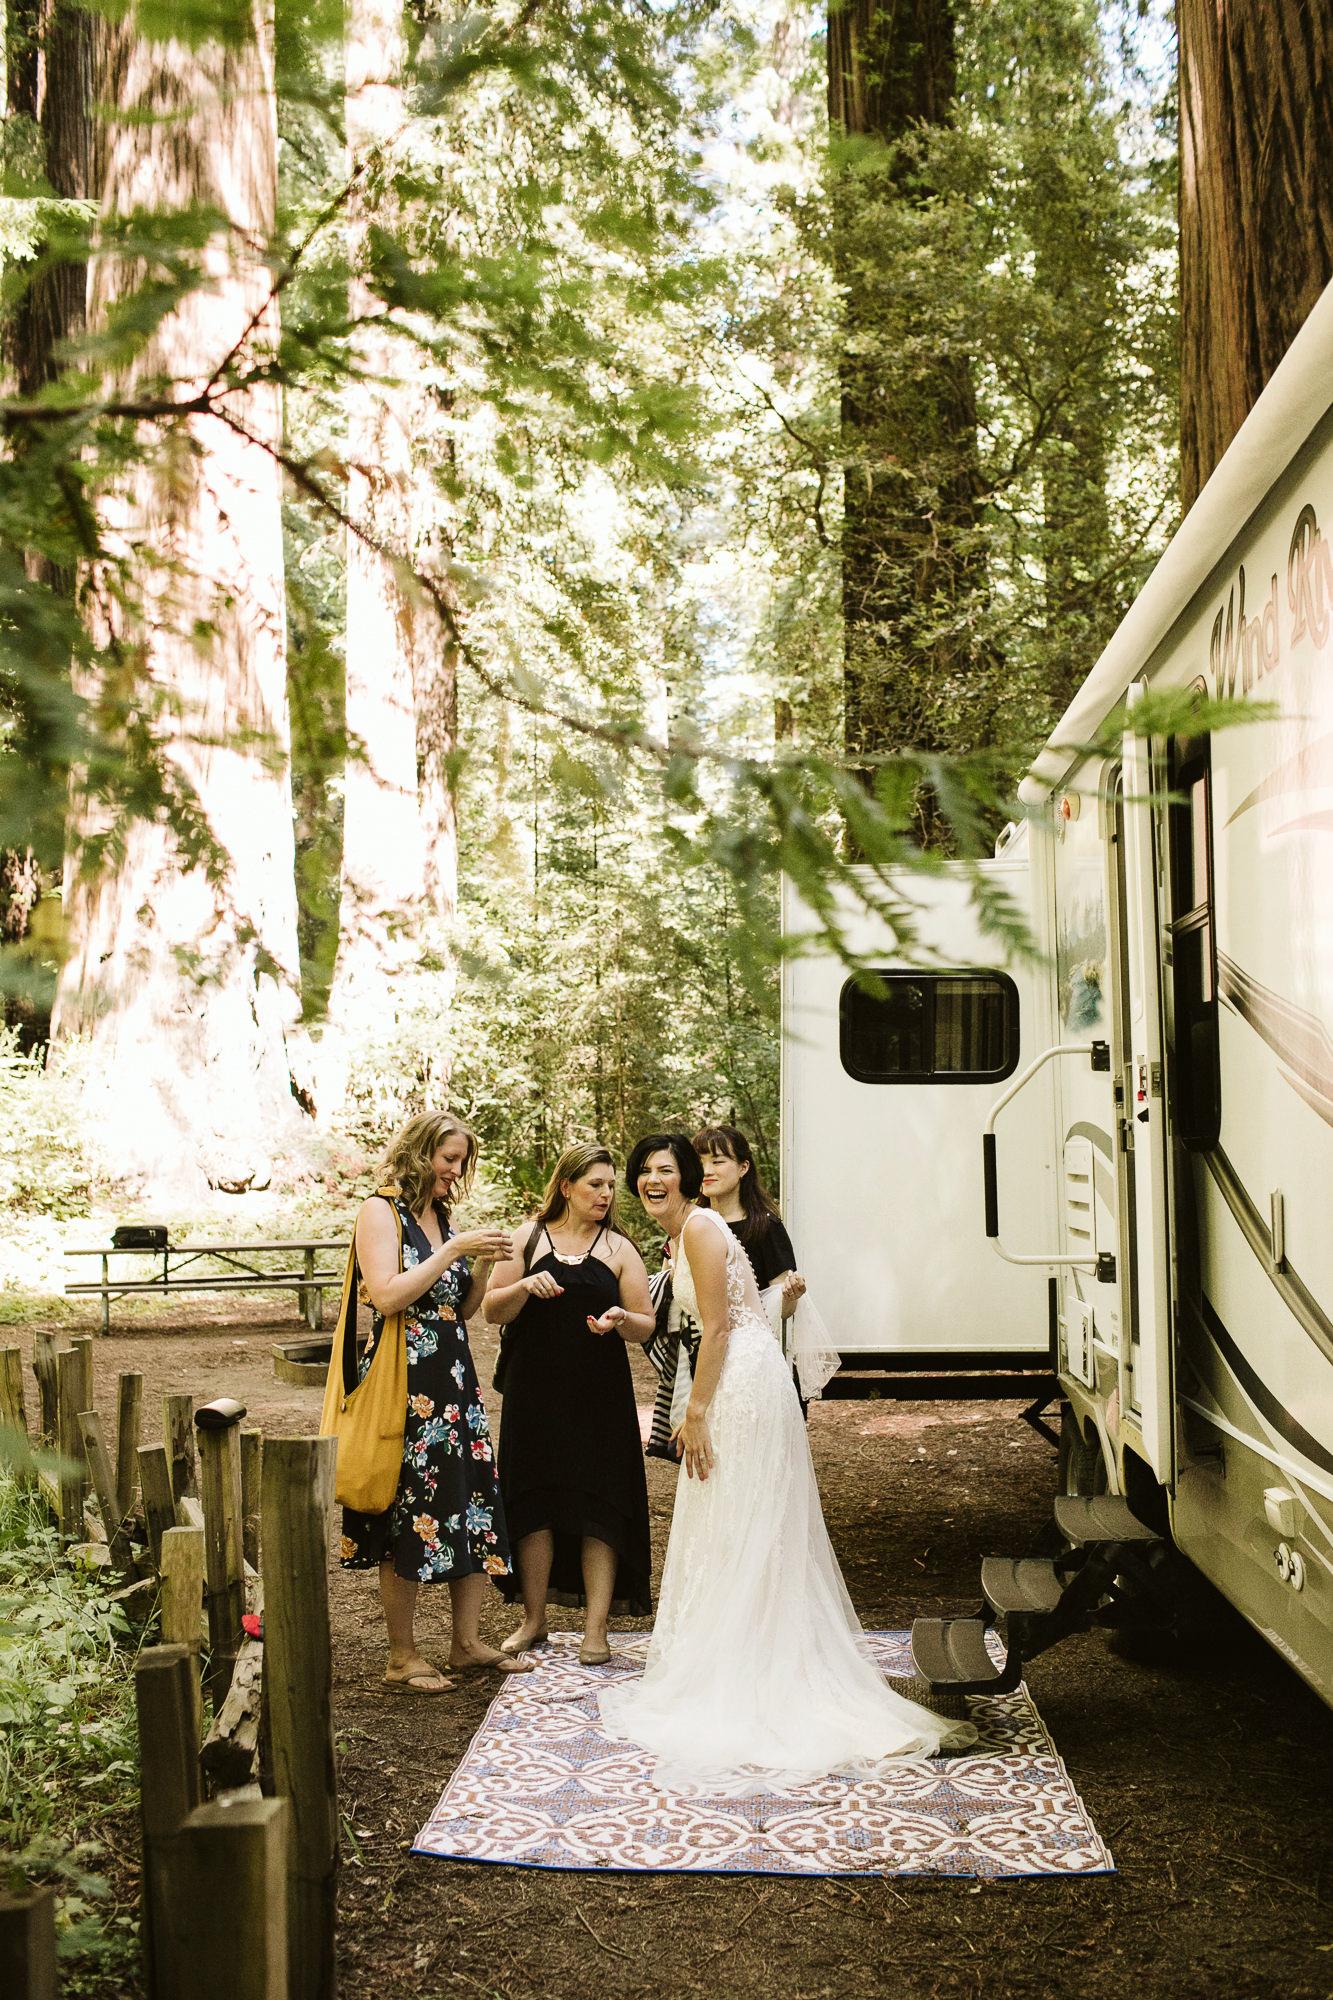 California-wedding-photographer-alfonso-flores-pamplin-groove-152.jpg